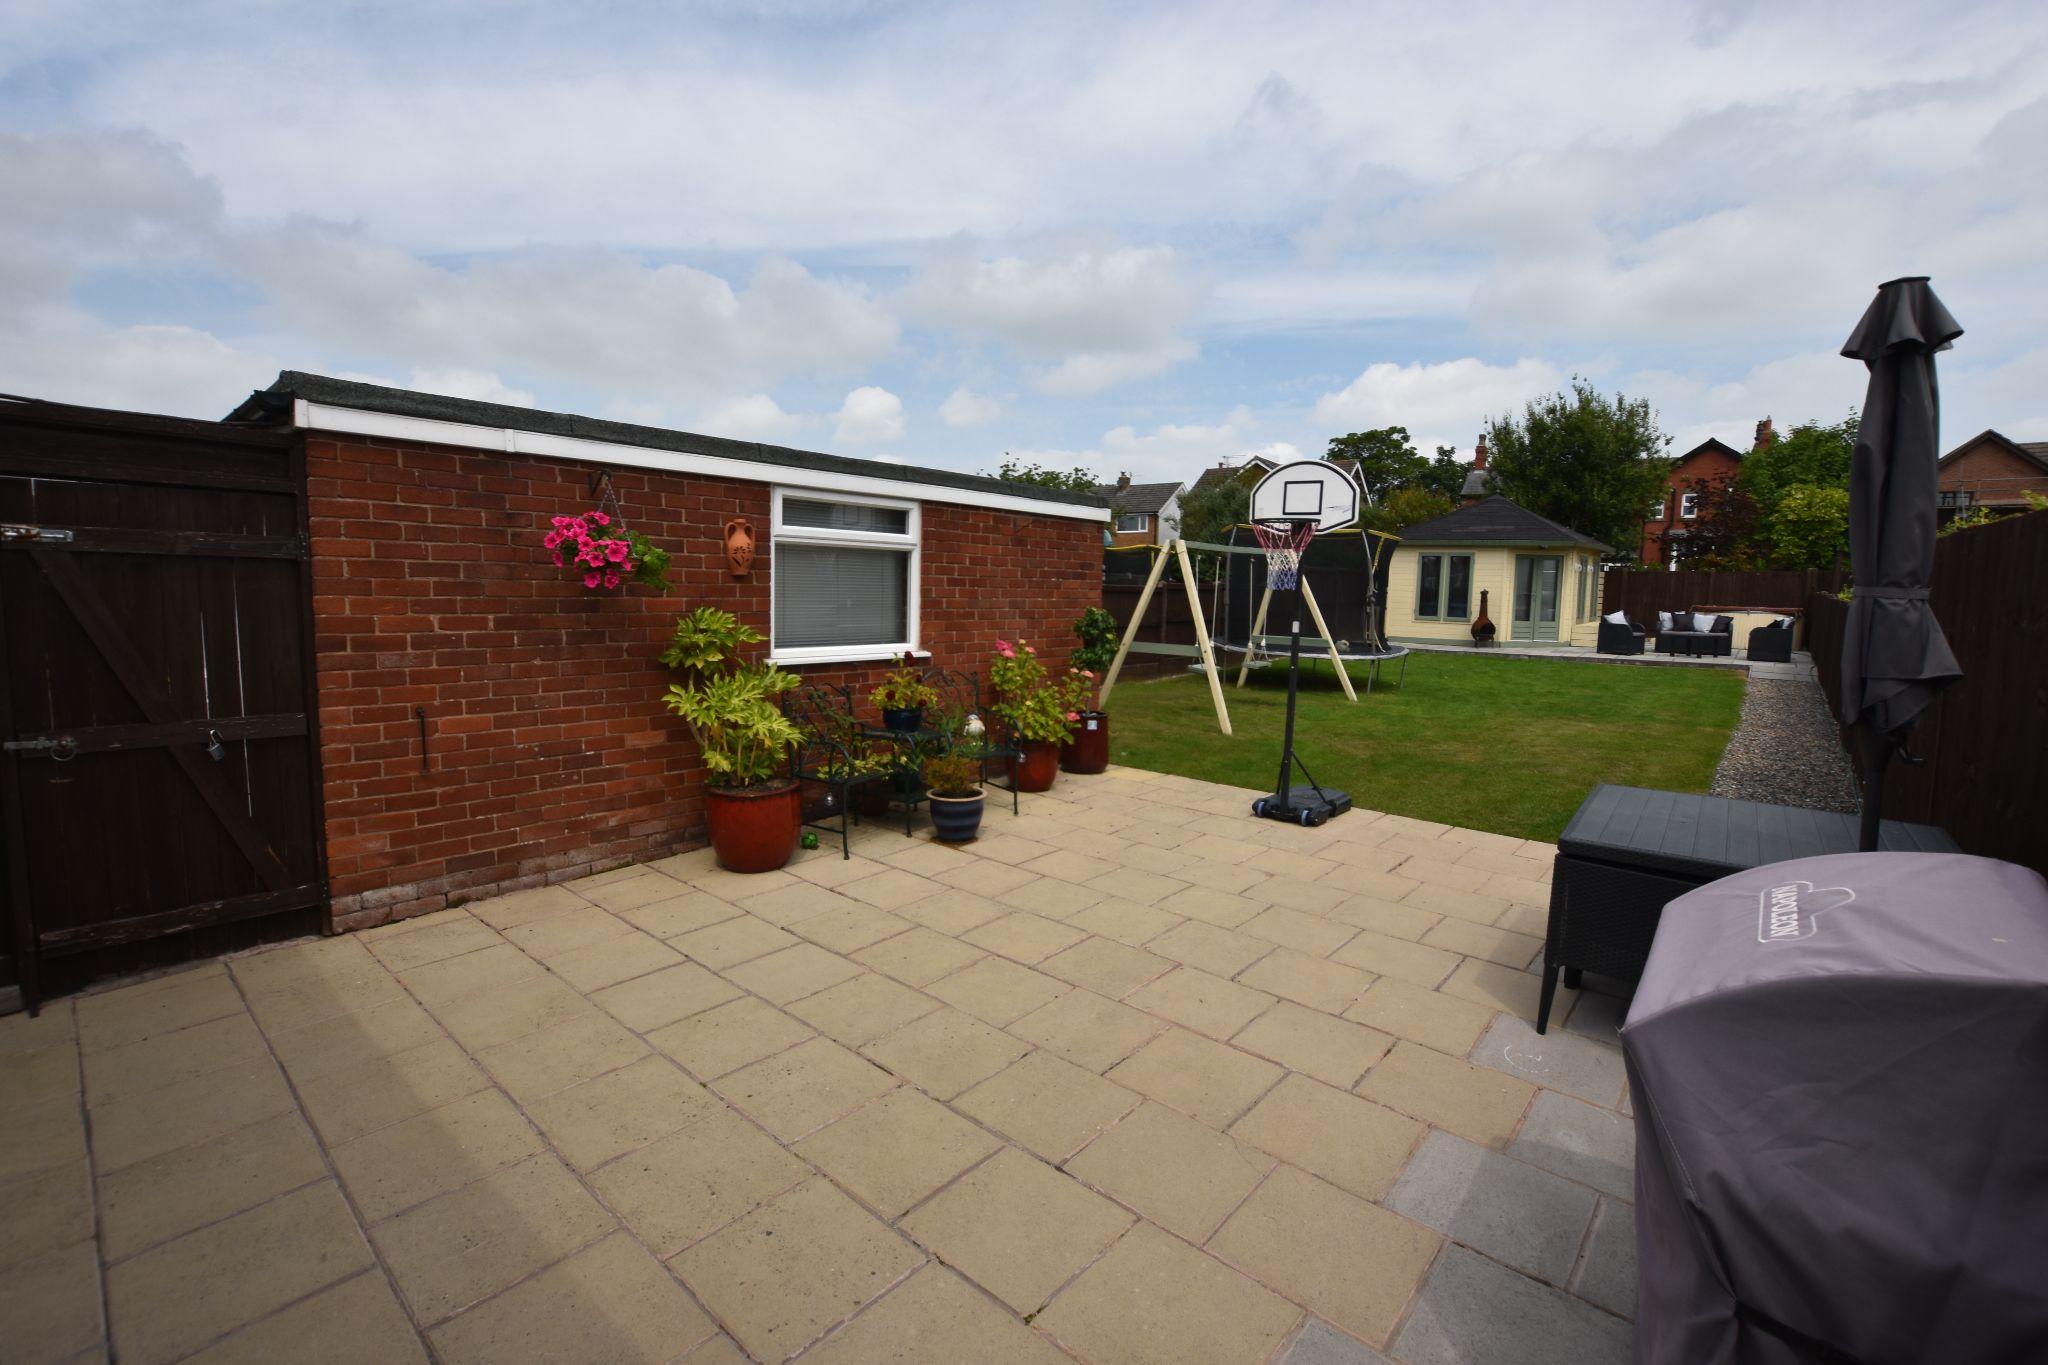 4 bedroom semi-detached bungalow Sold STC in Preston - Rear Garden